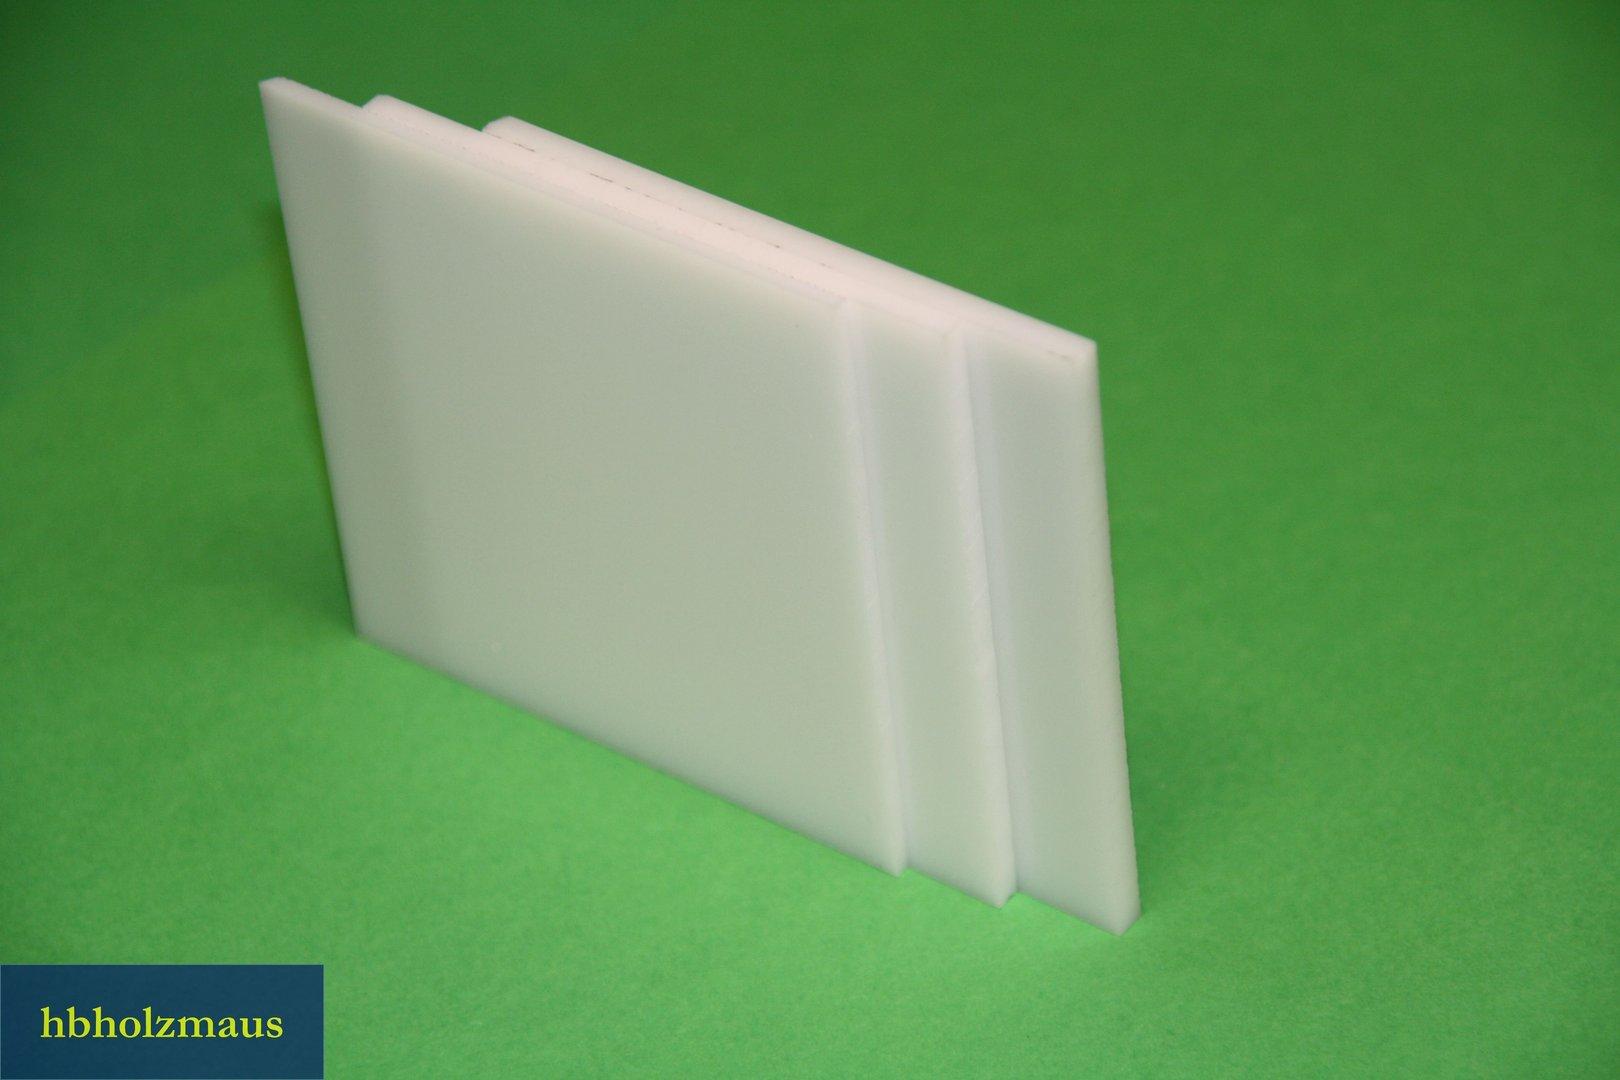 PVC Kömadur Hartplatte grau RAL7011 weiss schwarz kompaktes pvc Massivplatte